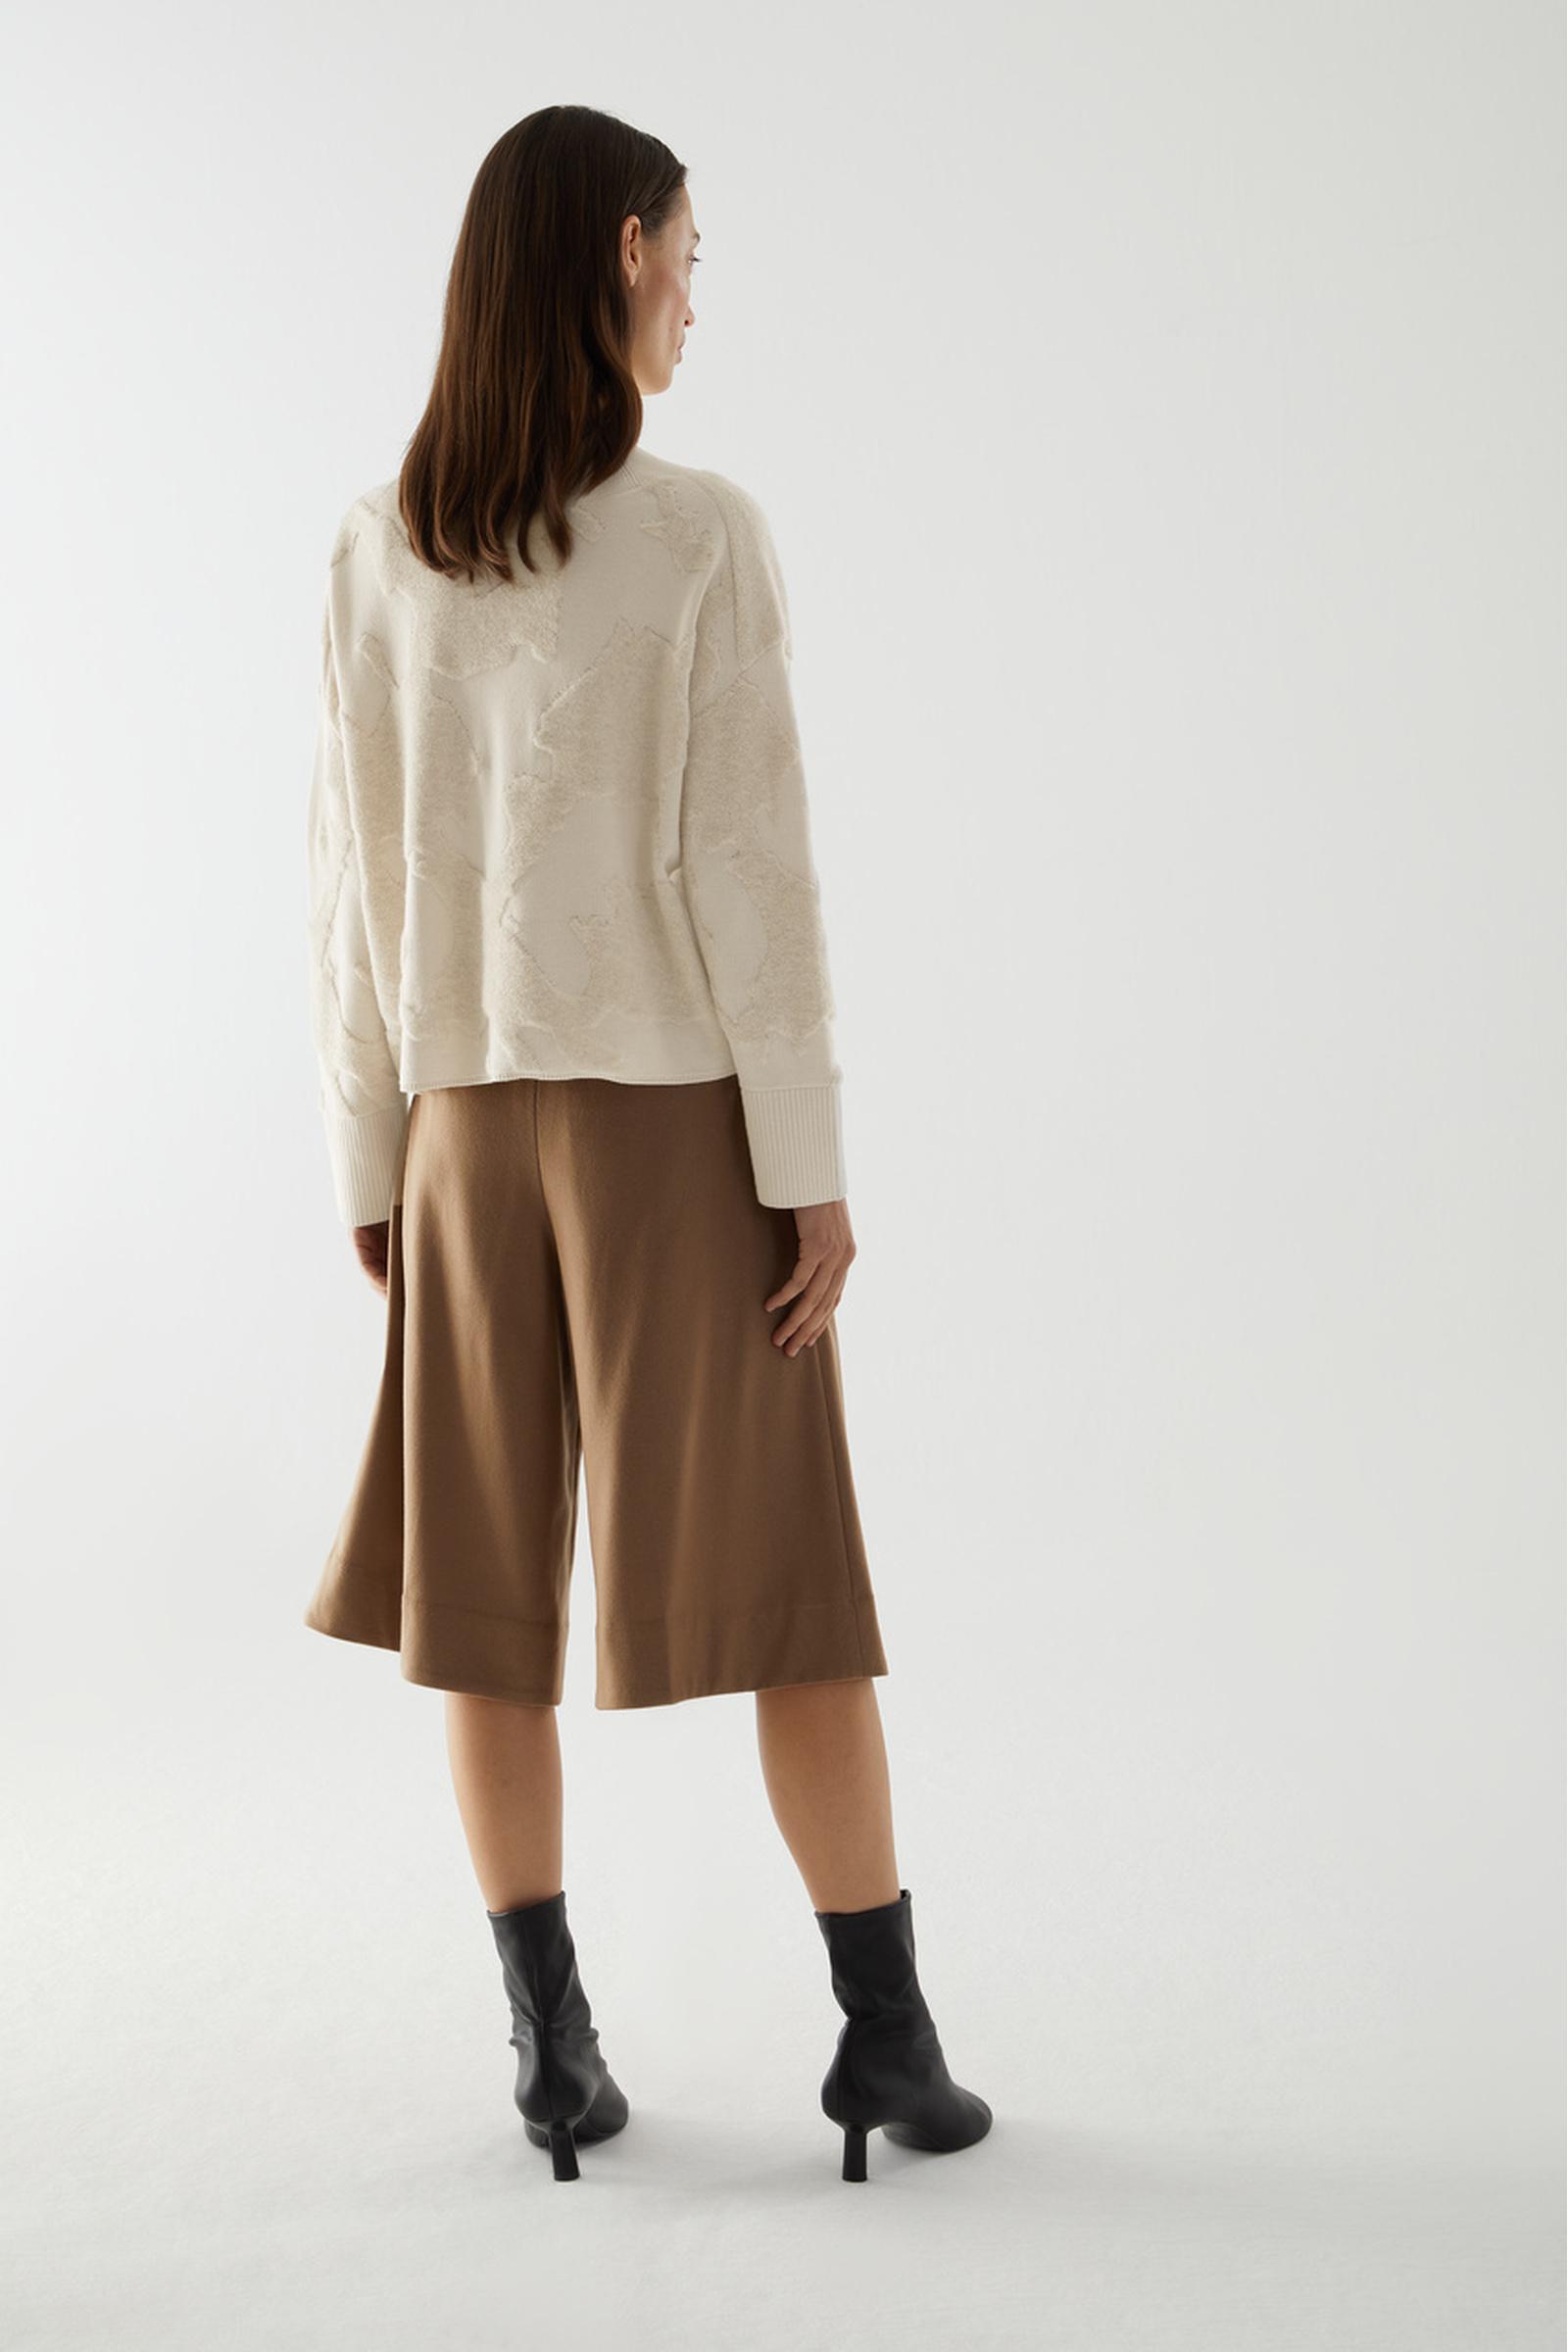 COS 오가닉 코튼 울 믹스 V넥 패턴드 스웨터의 베이지컬러 ECOMLook입니다.